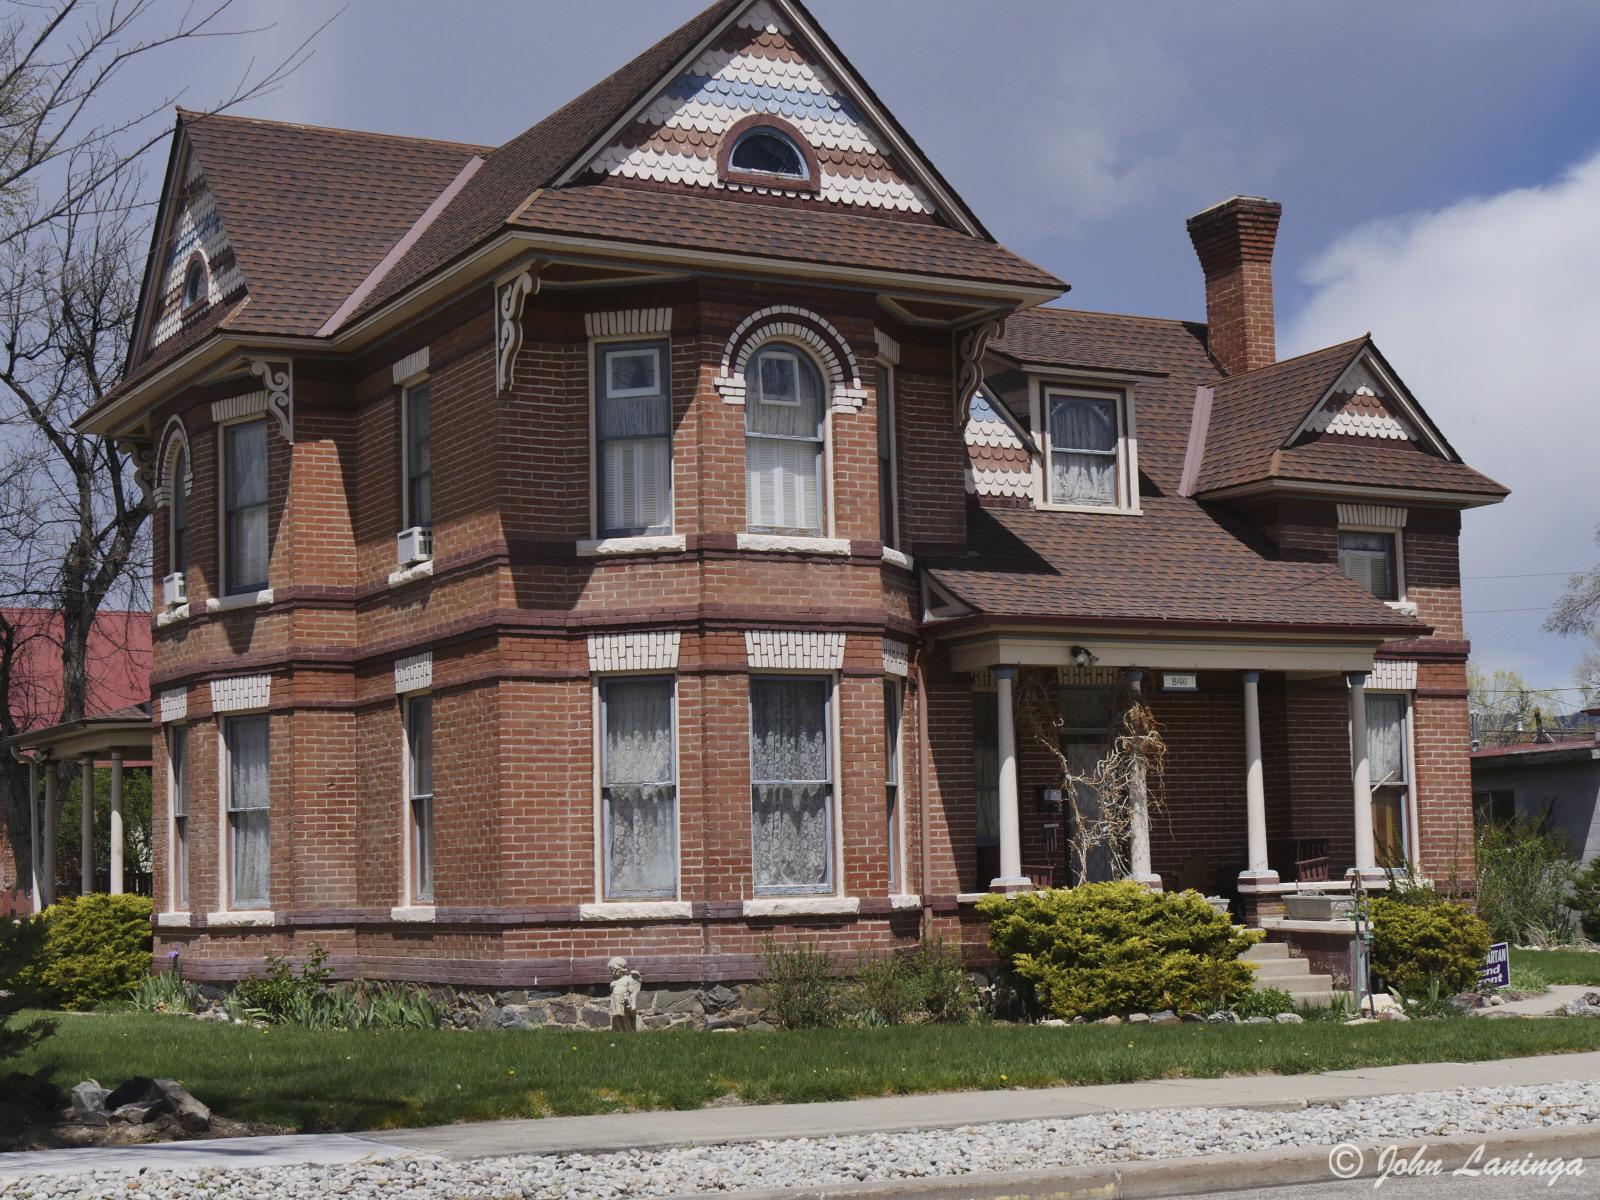 An interesting house